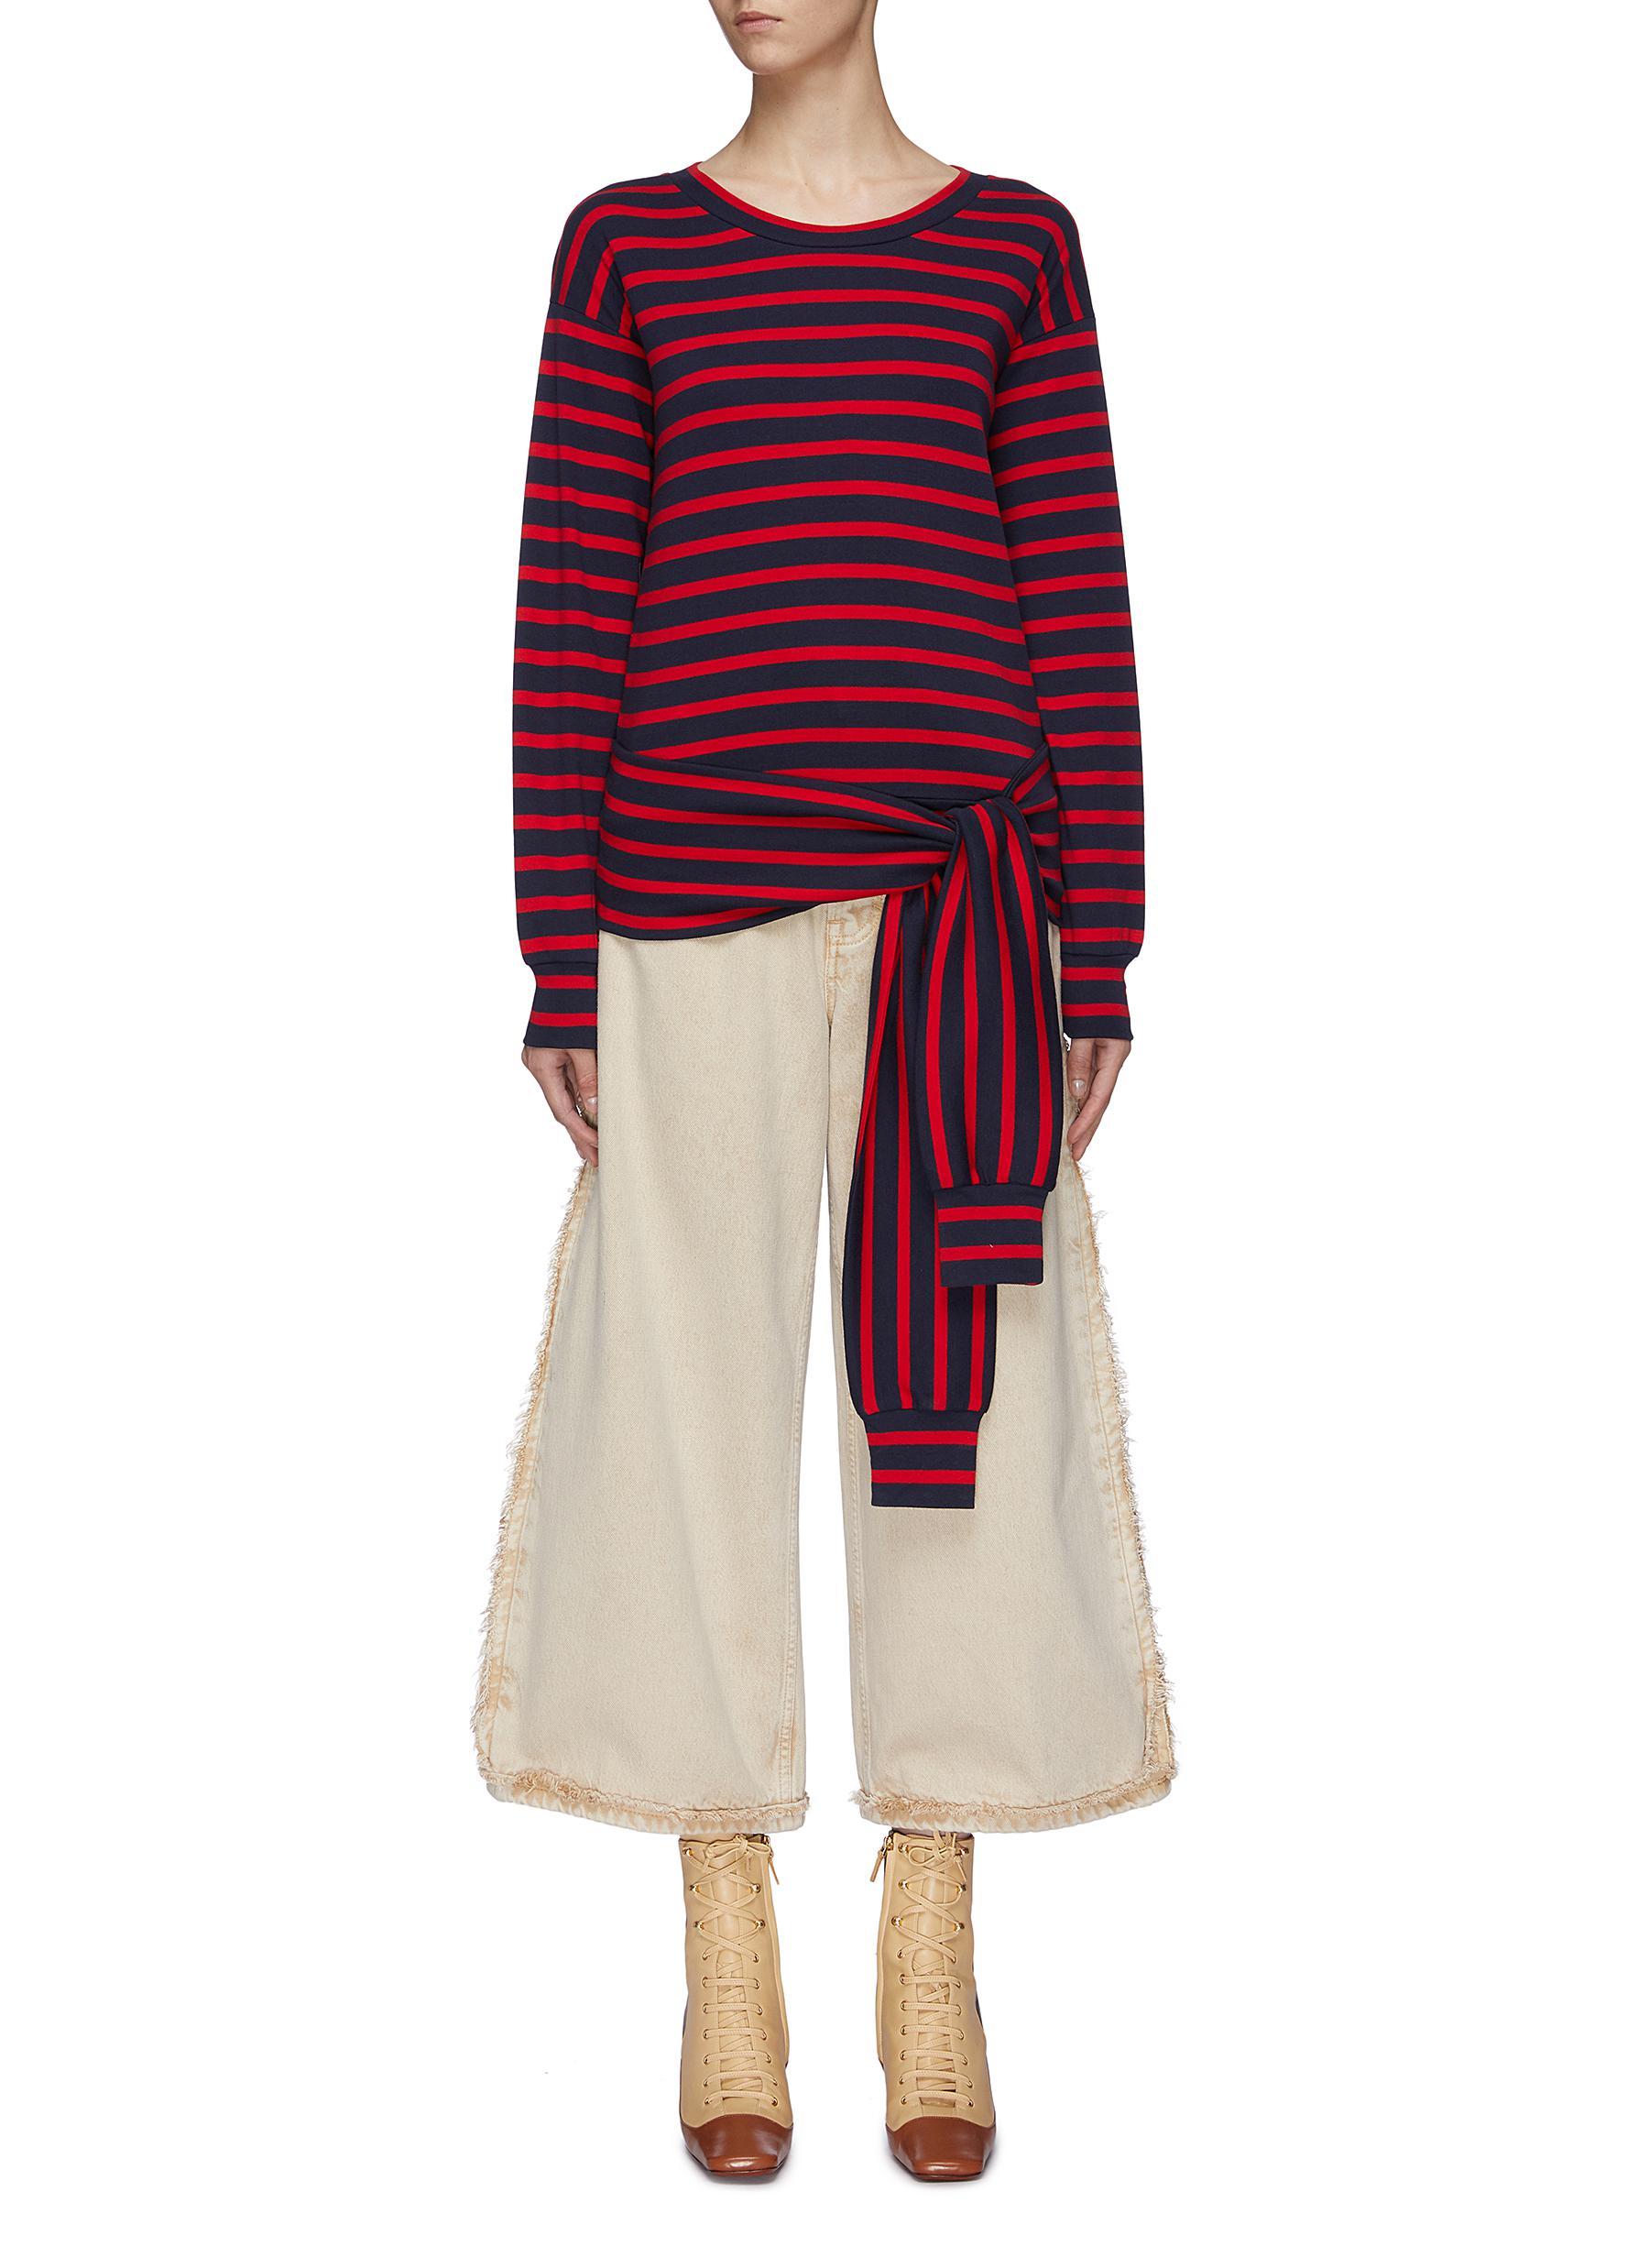 Sleeve tie waist stripe sweatshirt by Sonia Rykiel